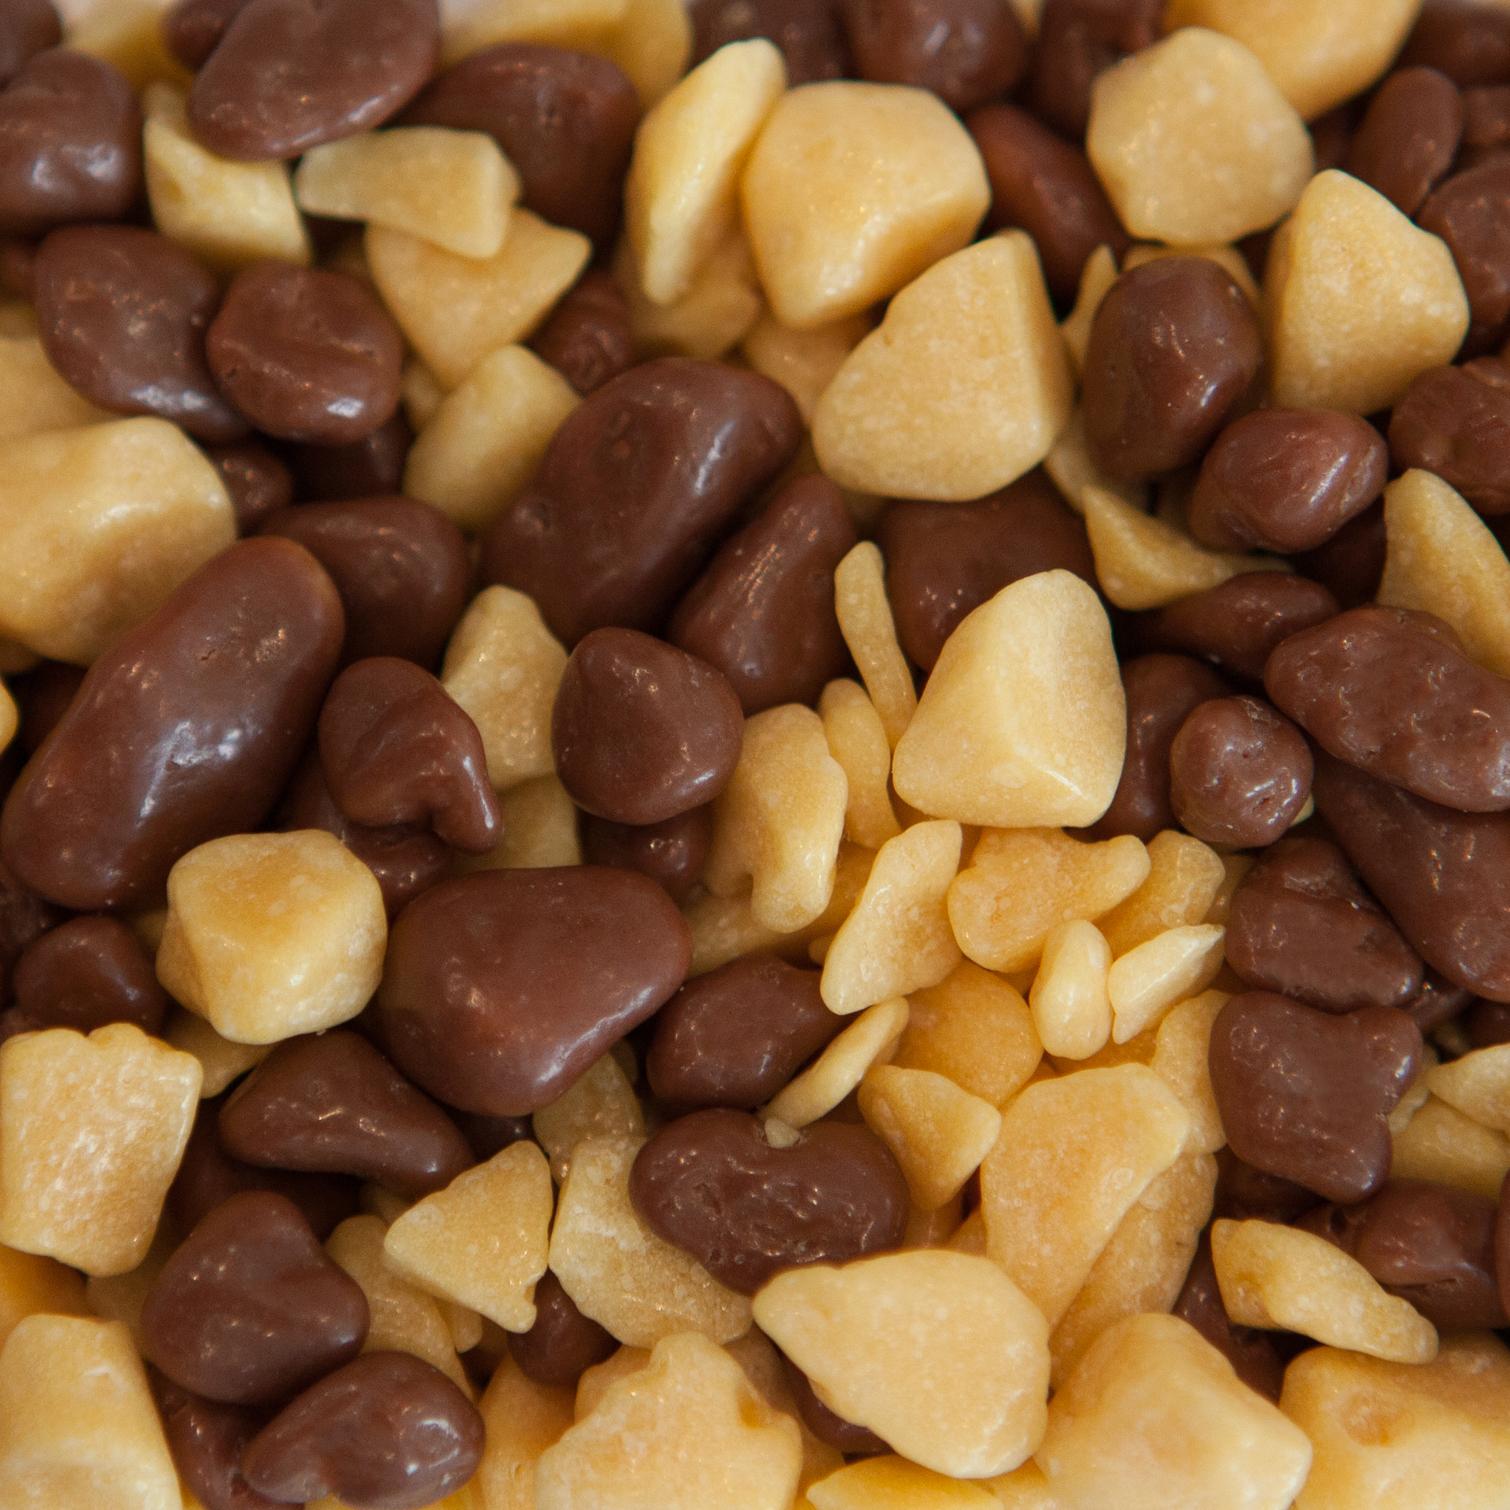 Honeycomb Mixed Fat Coated & Milk Chocolate